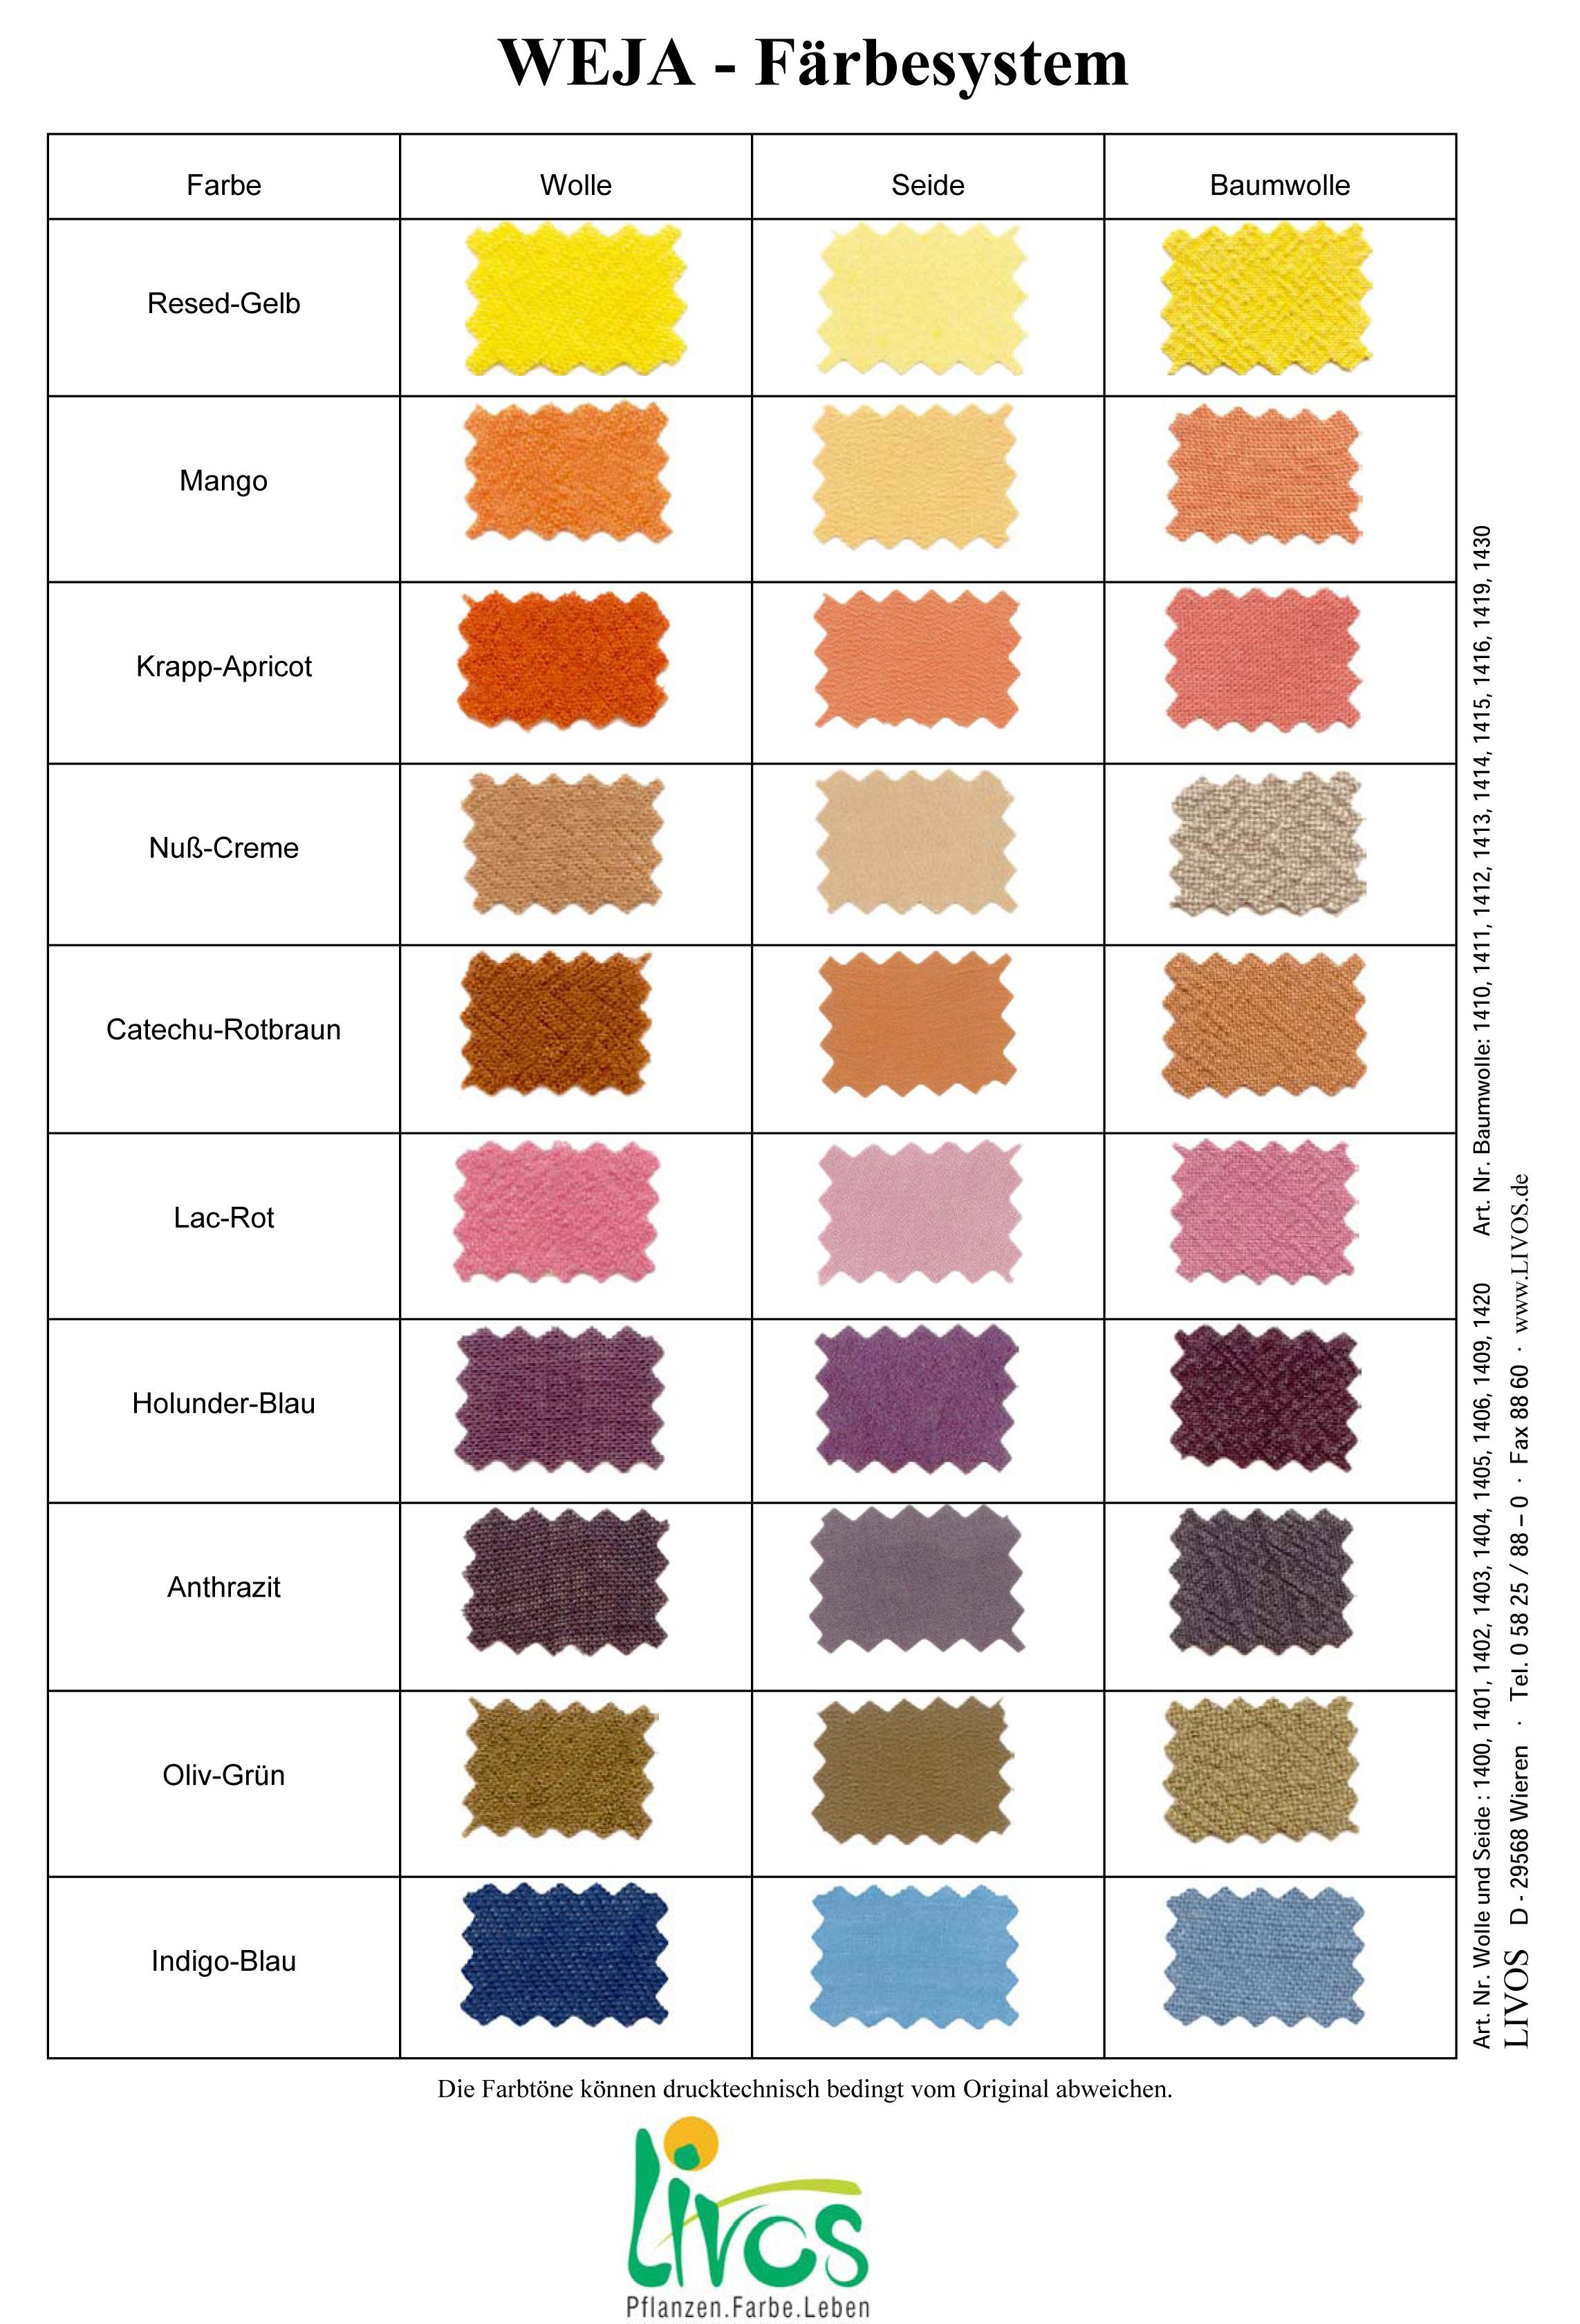 weja farvekort med resedagul